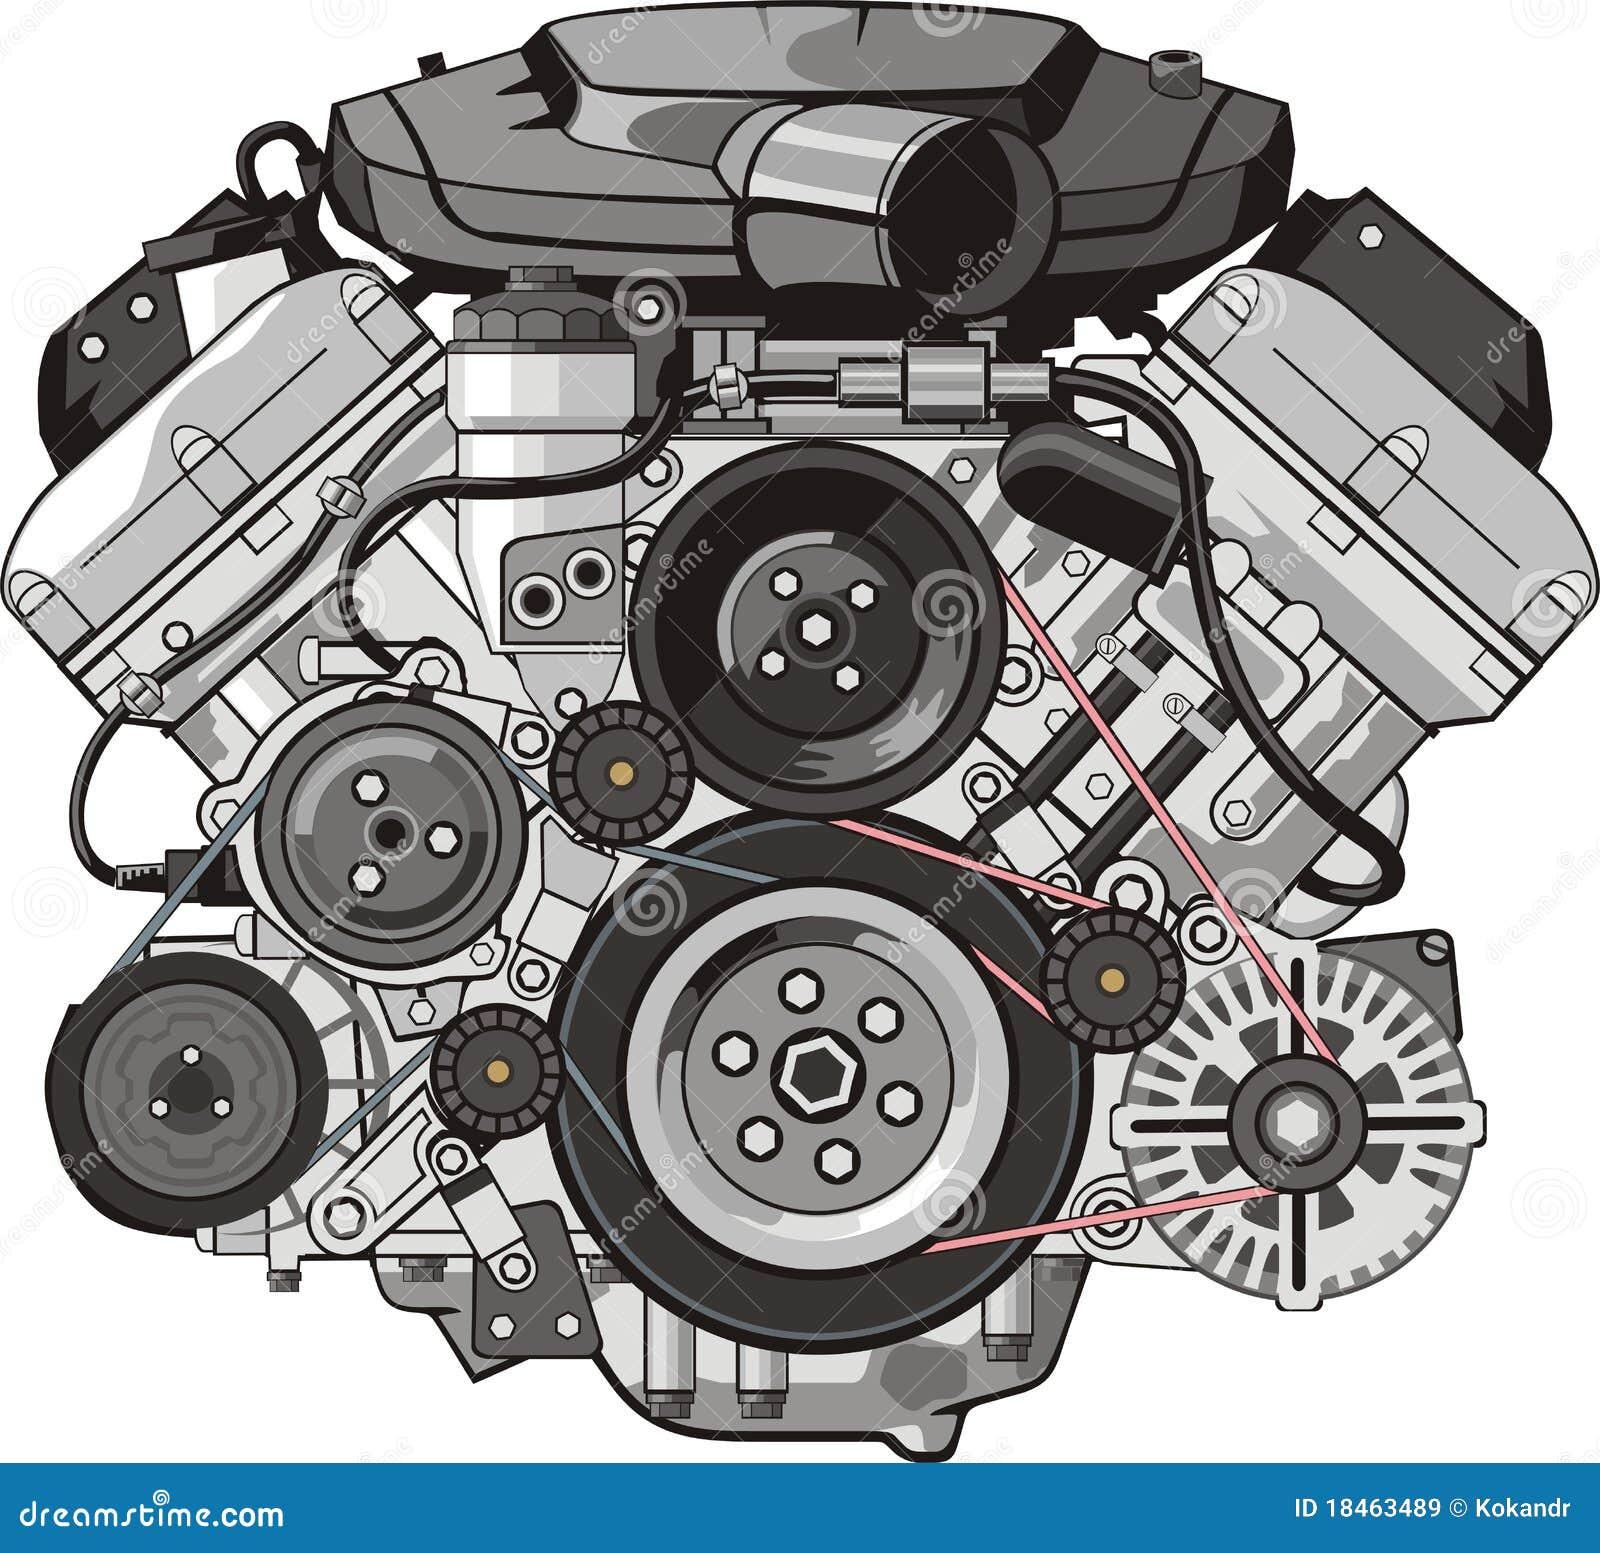 engine clip art free - photo #22